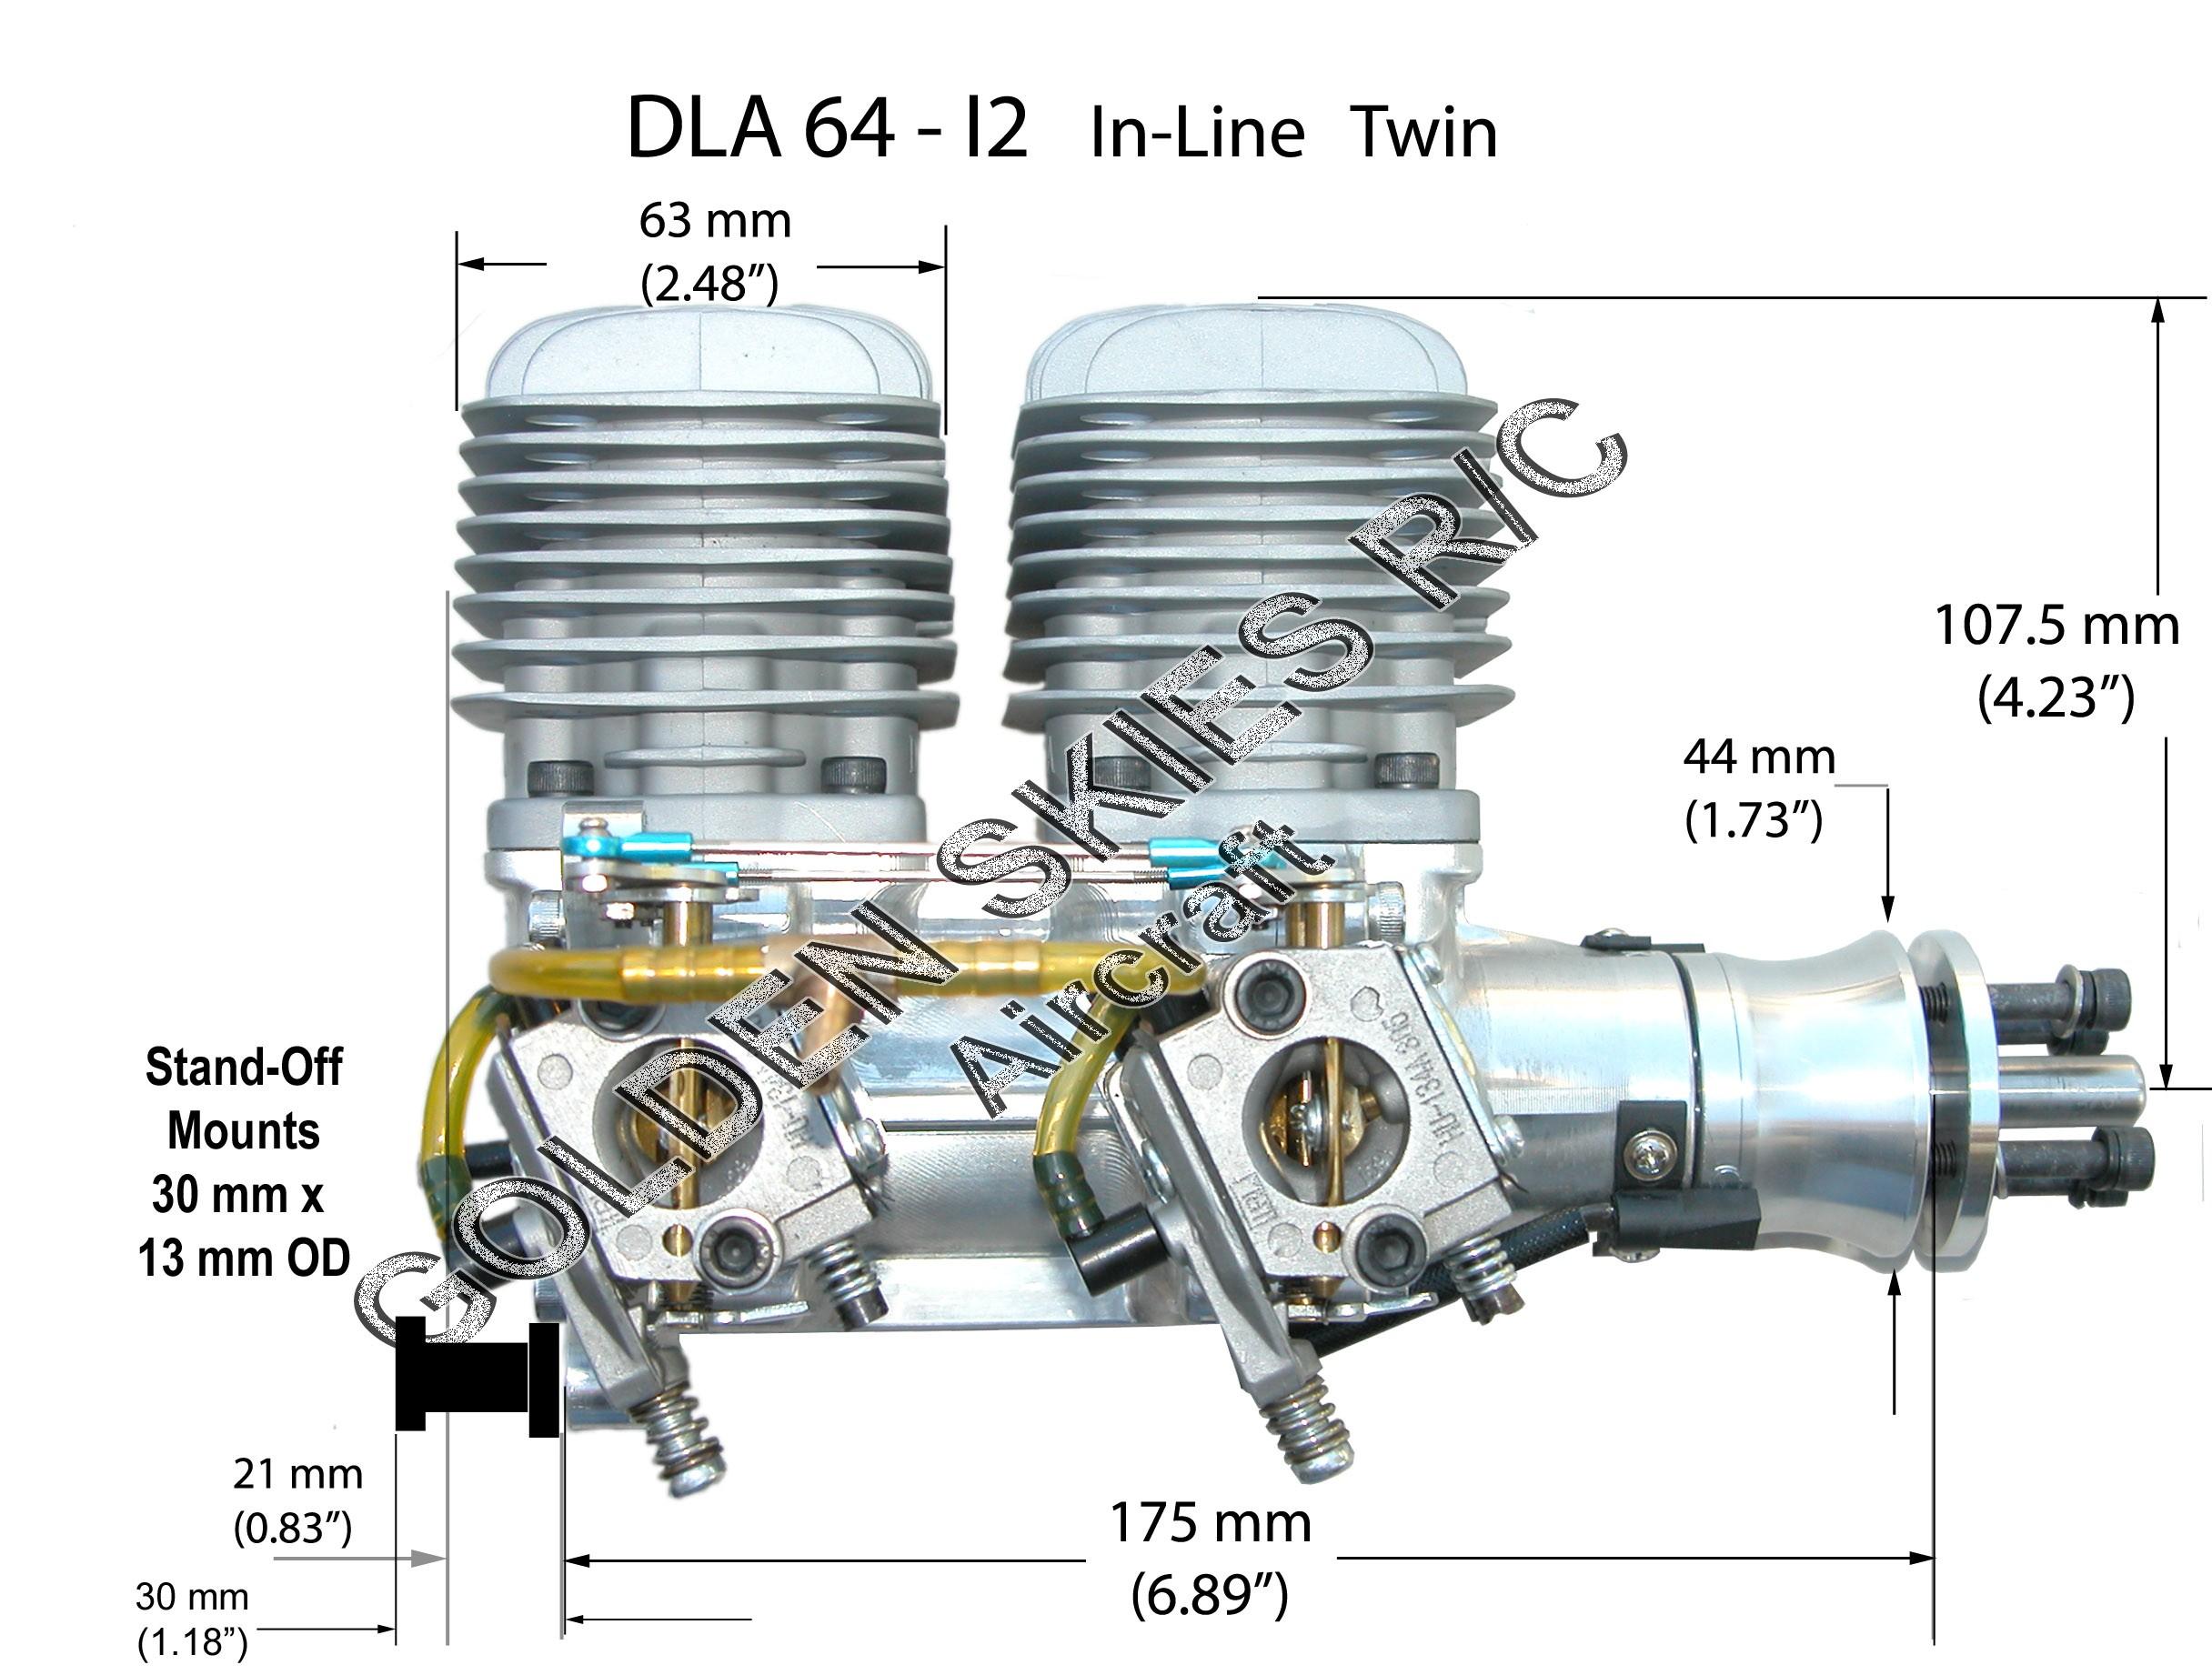 inline engine diagram index listing of wiring diagrams